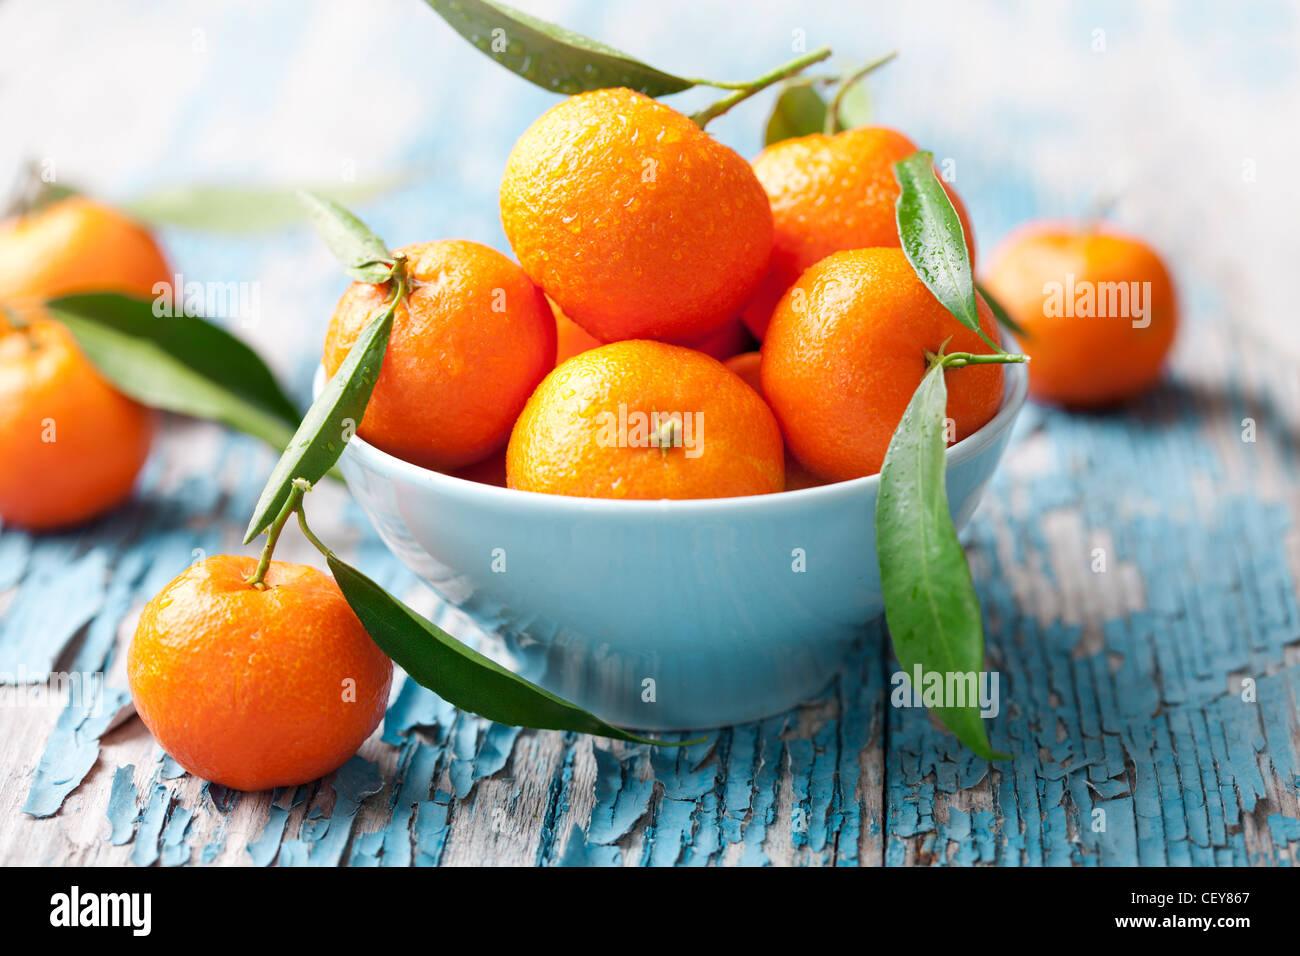 fresh mandarins, oranges - Stock Image